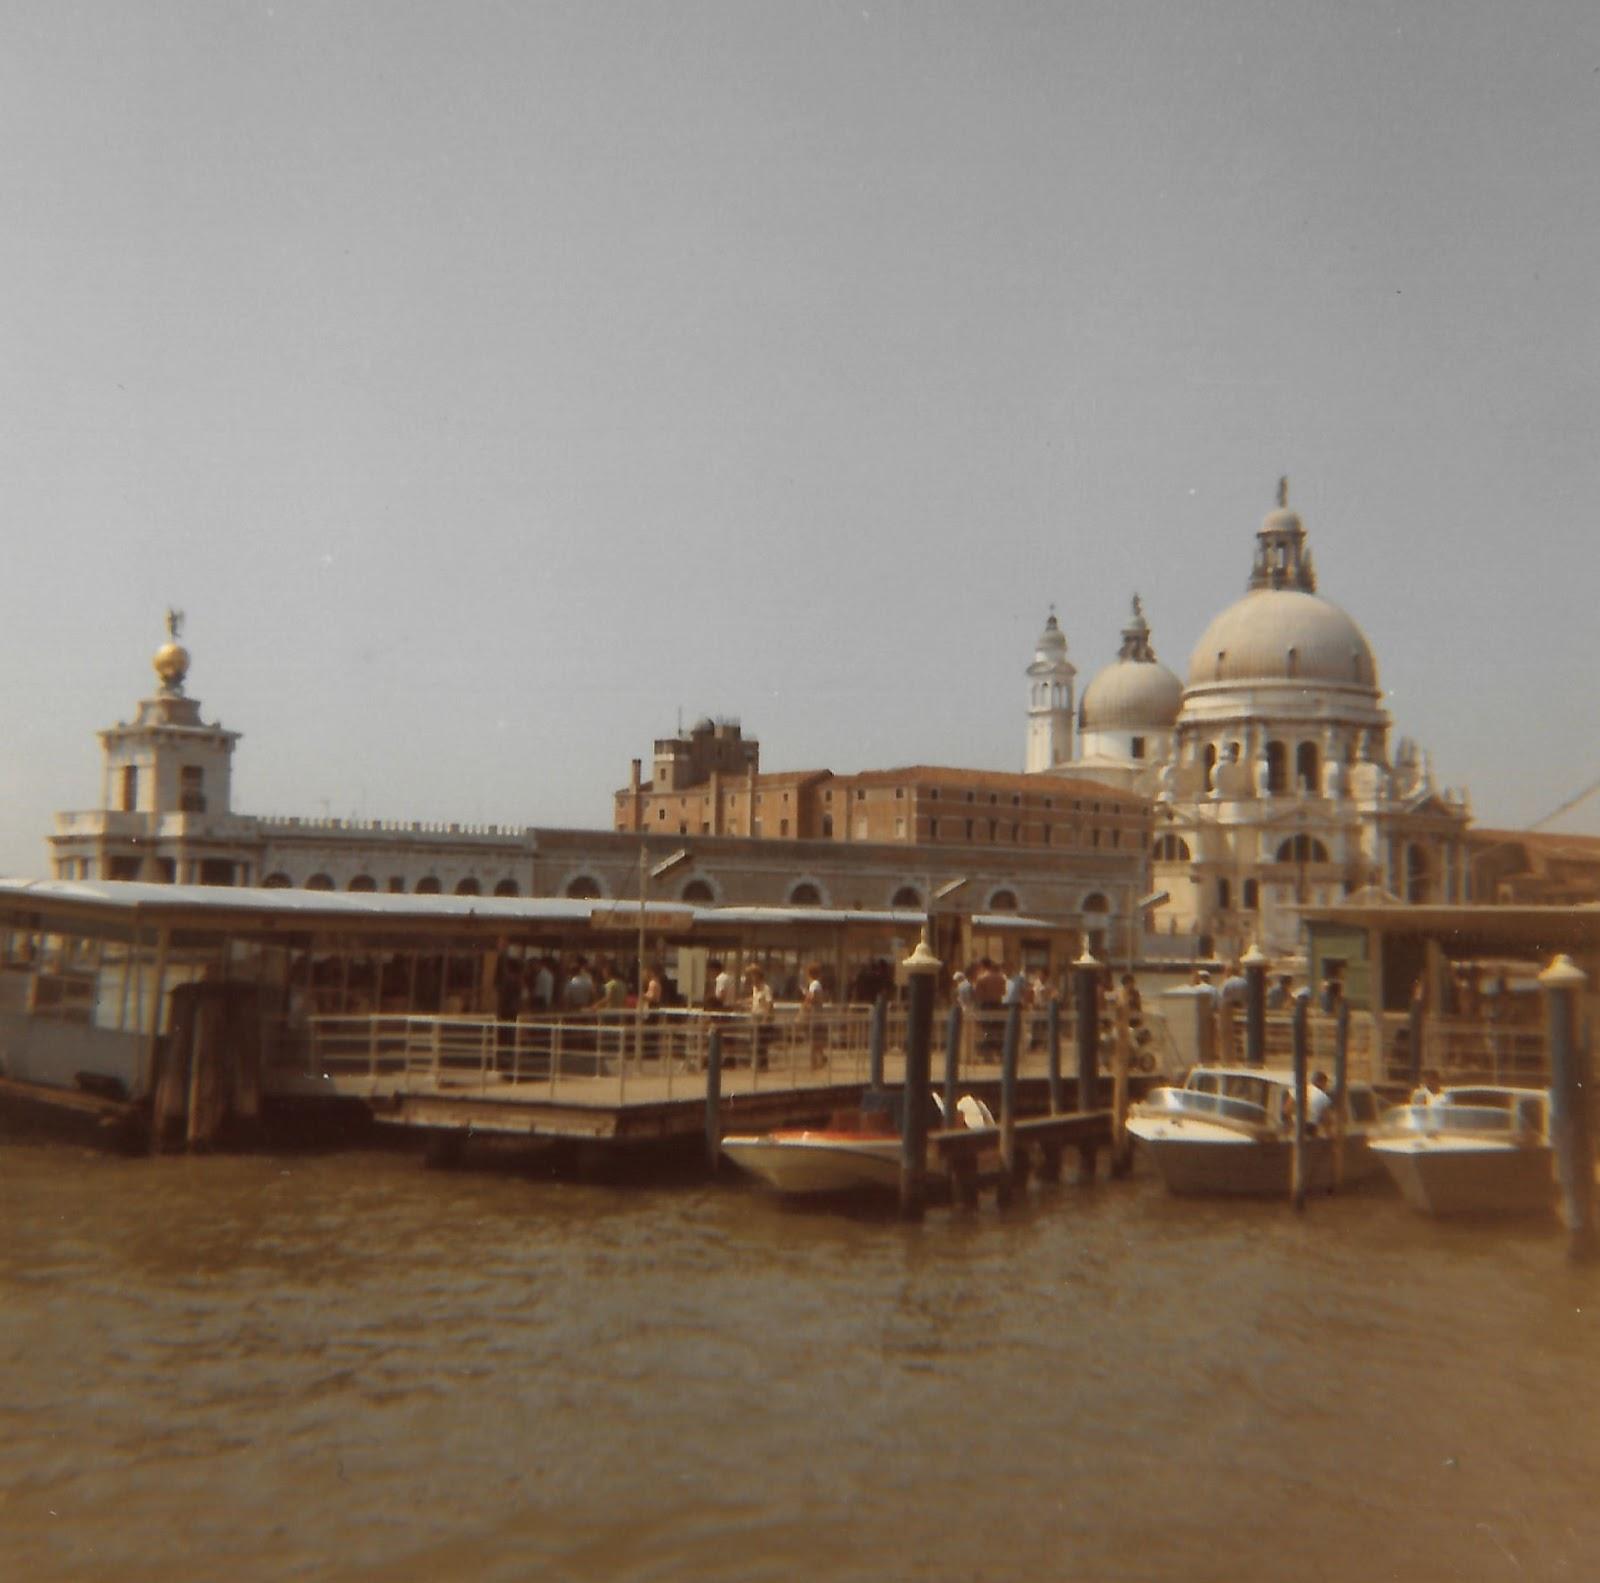 Paul\'s Beer & Travel Blog: Interrail 1975 Part Three - Croatia & Italy